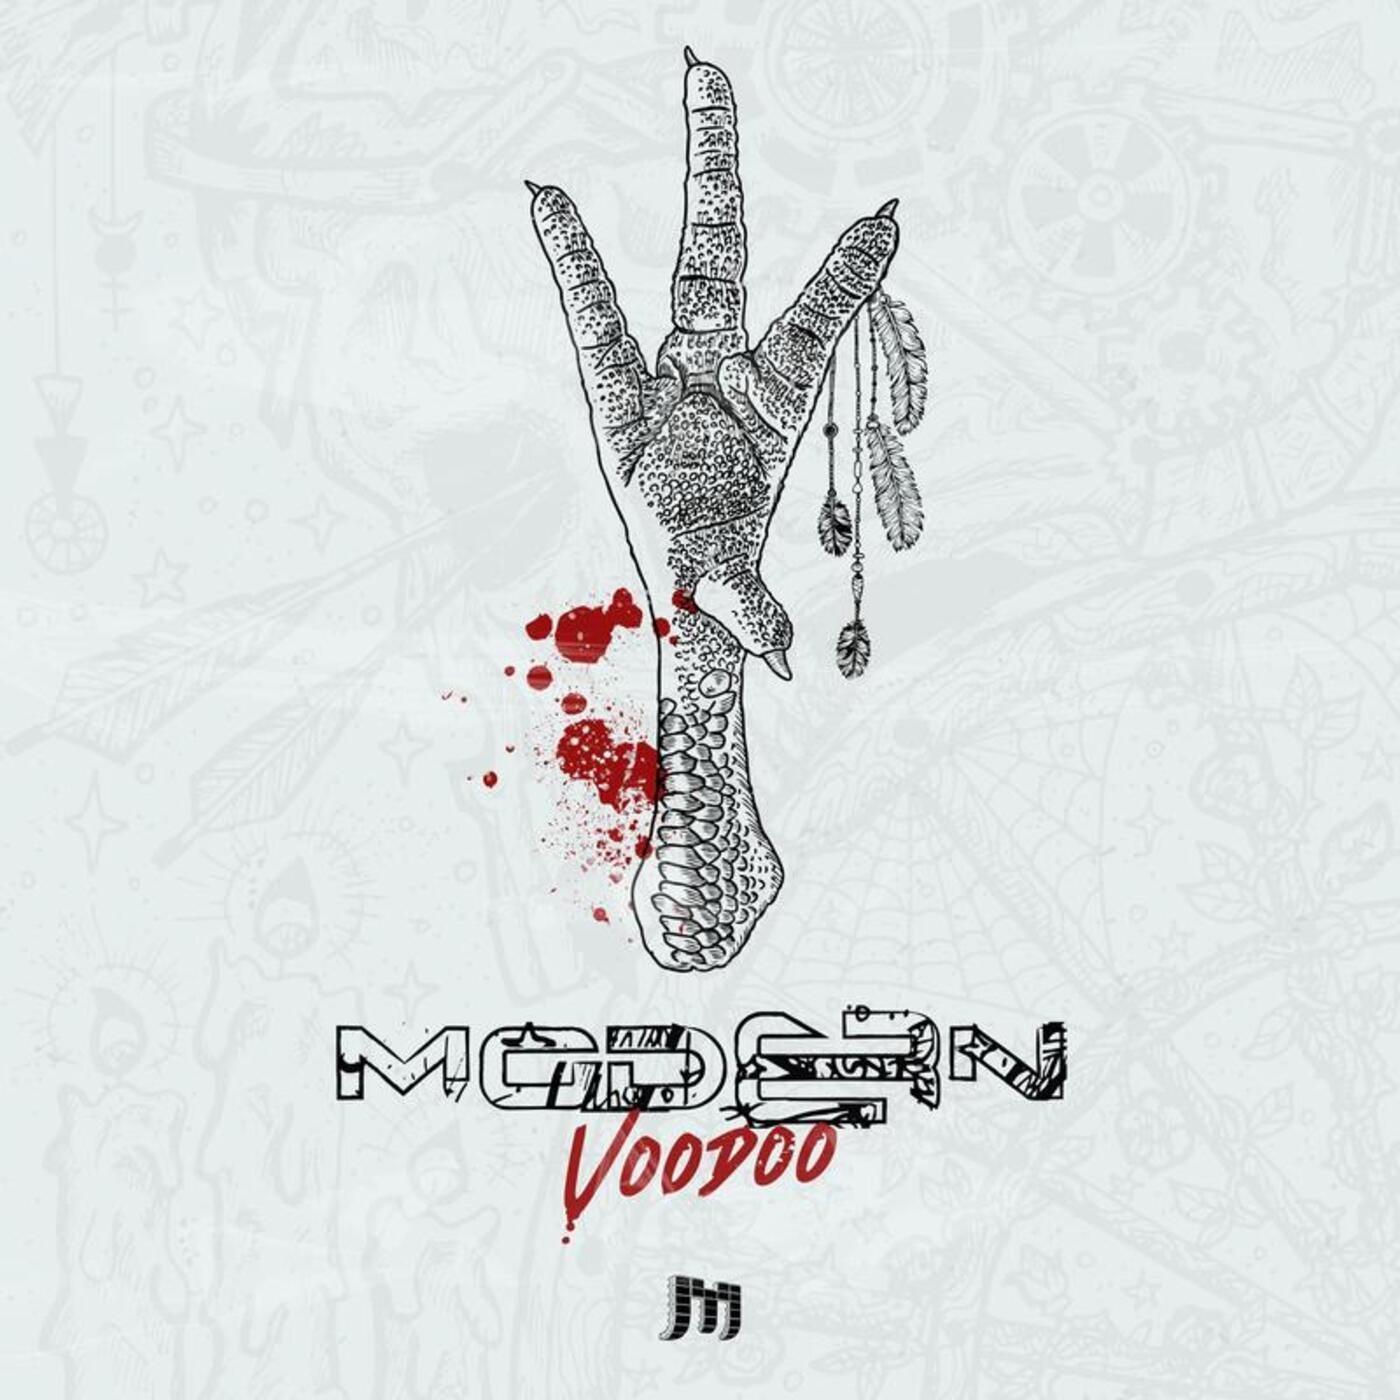 Voodoo (Original Mix)